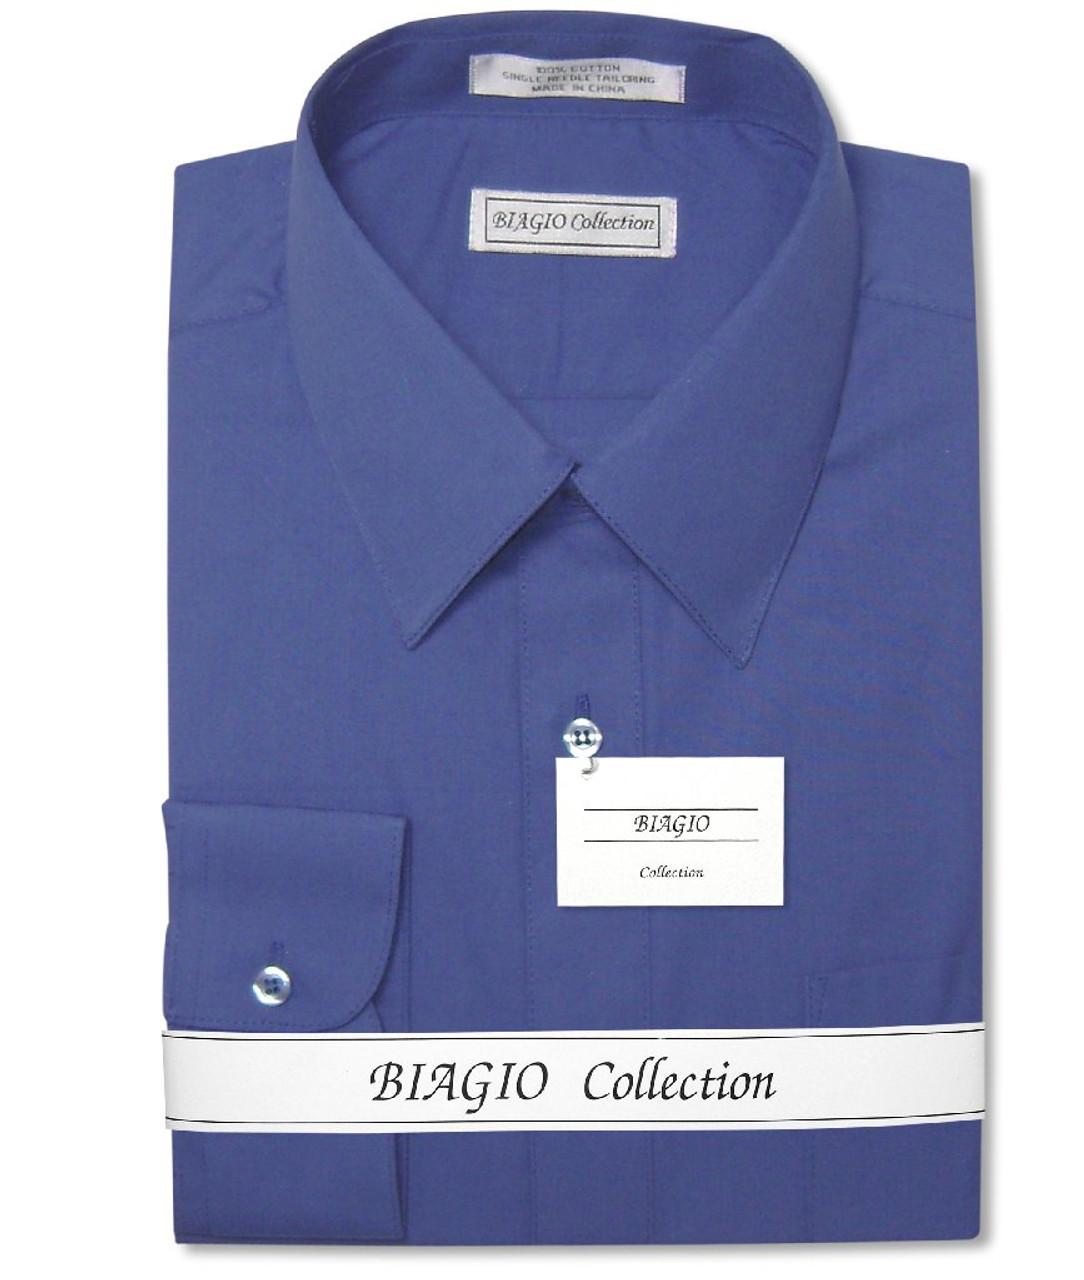 Biagio Mens 100/% COTTON Solid WHITE Color Dress Shirt sz 18 34//35